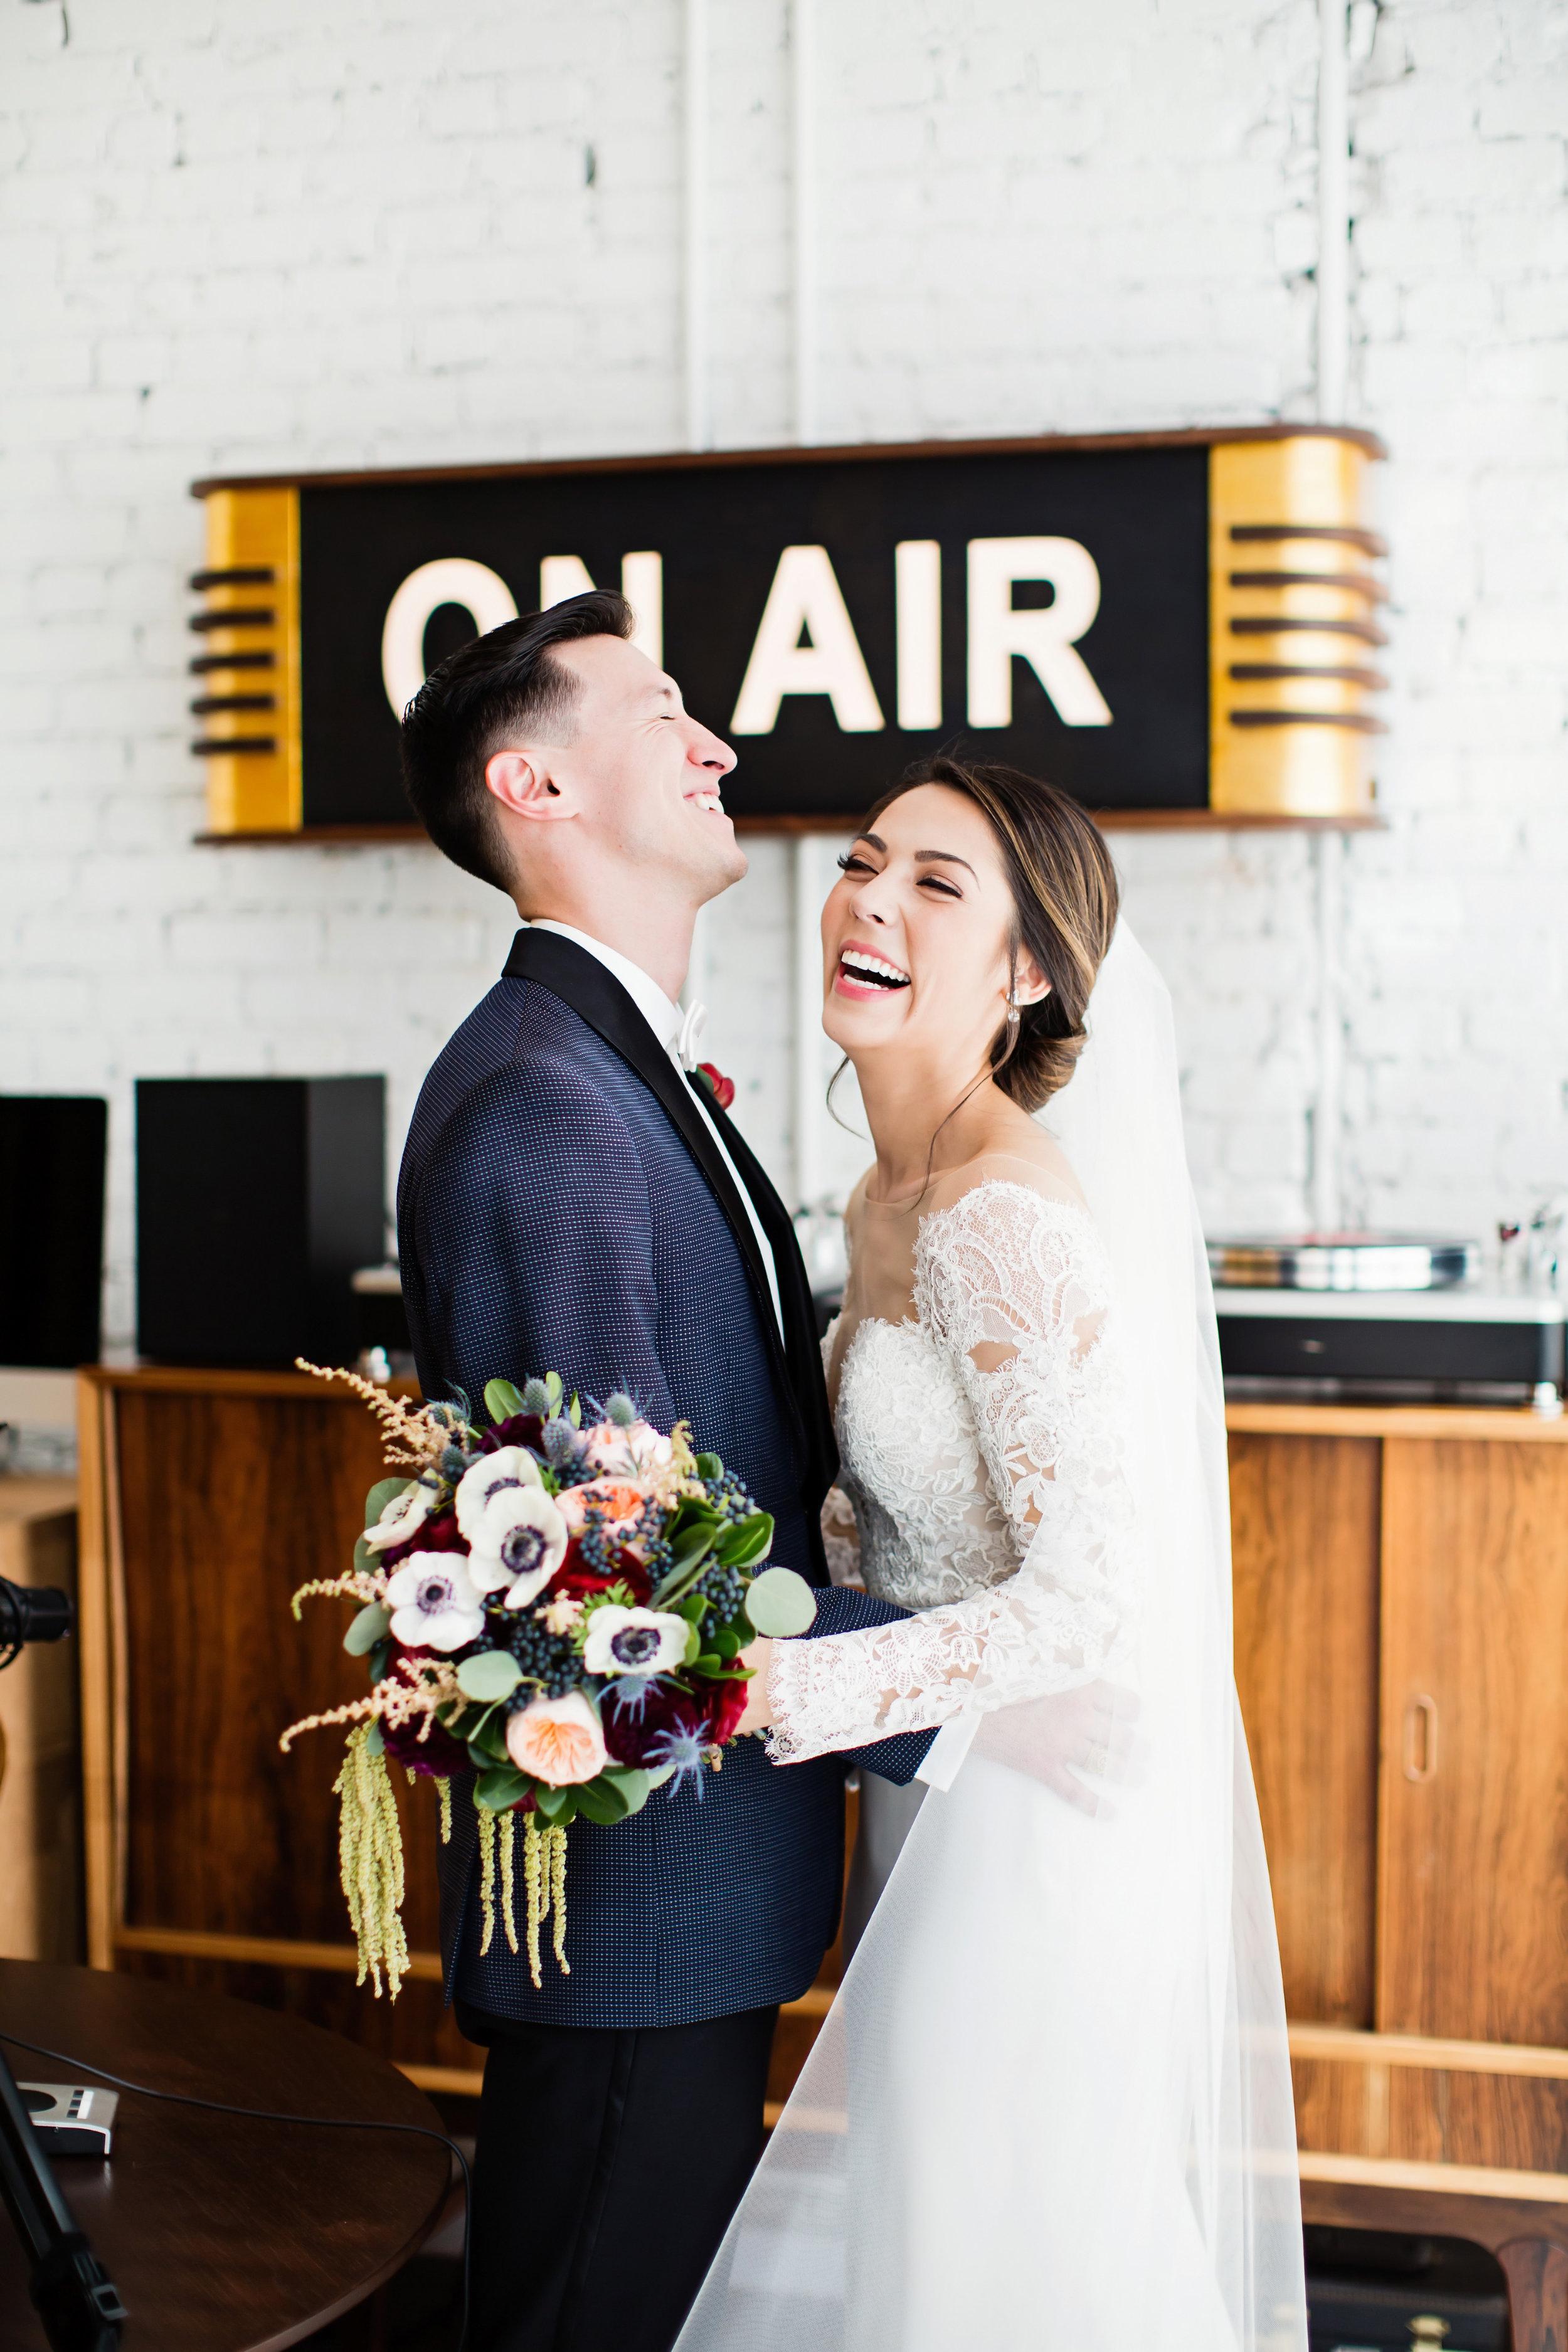 stylish-wedding-photography-windsor-toronto-ontario-wedding-photographer-winery-eryn-shea-photography-05.jpg